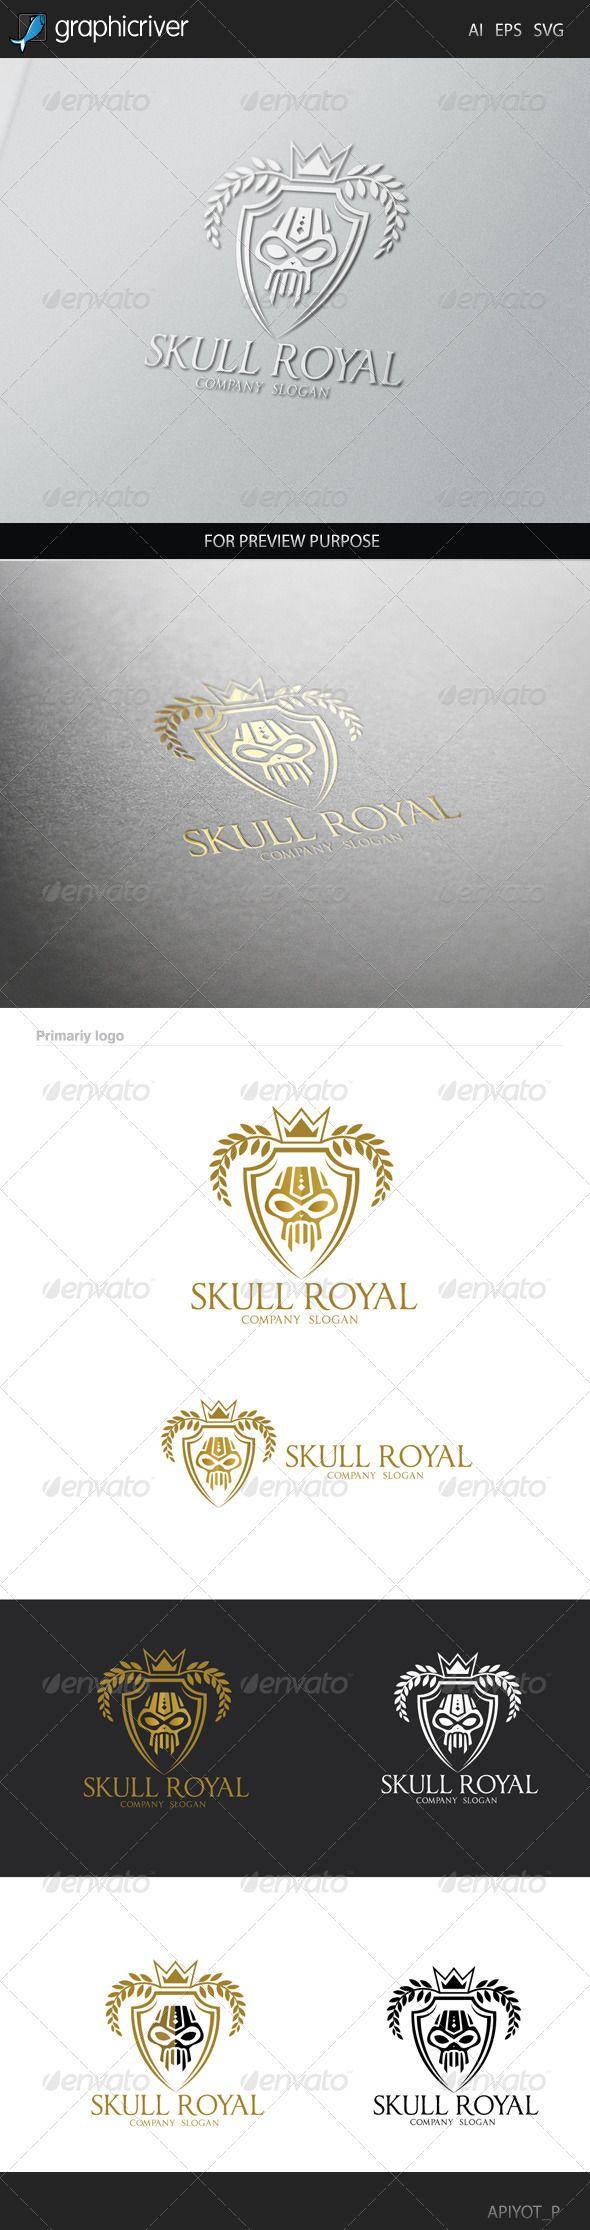 Best 25 royal logo ideas on pinterest crown logo king logo and skull royal logo magicingreecefo Images